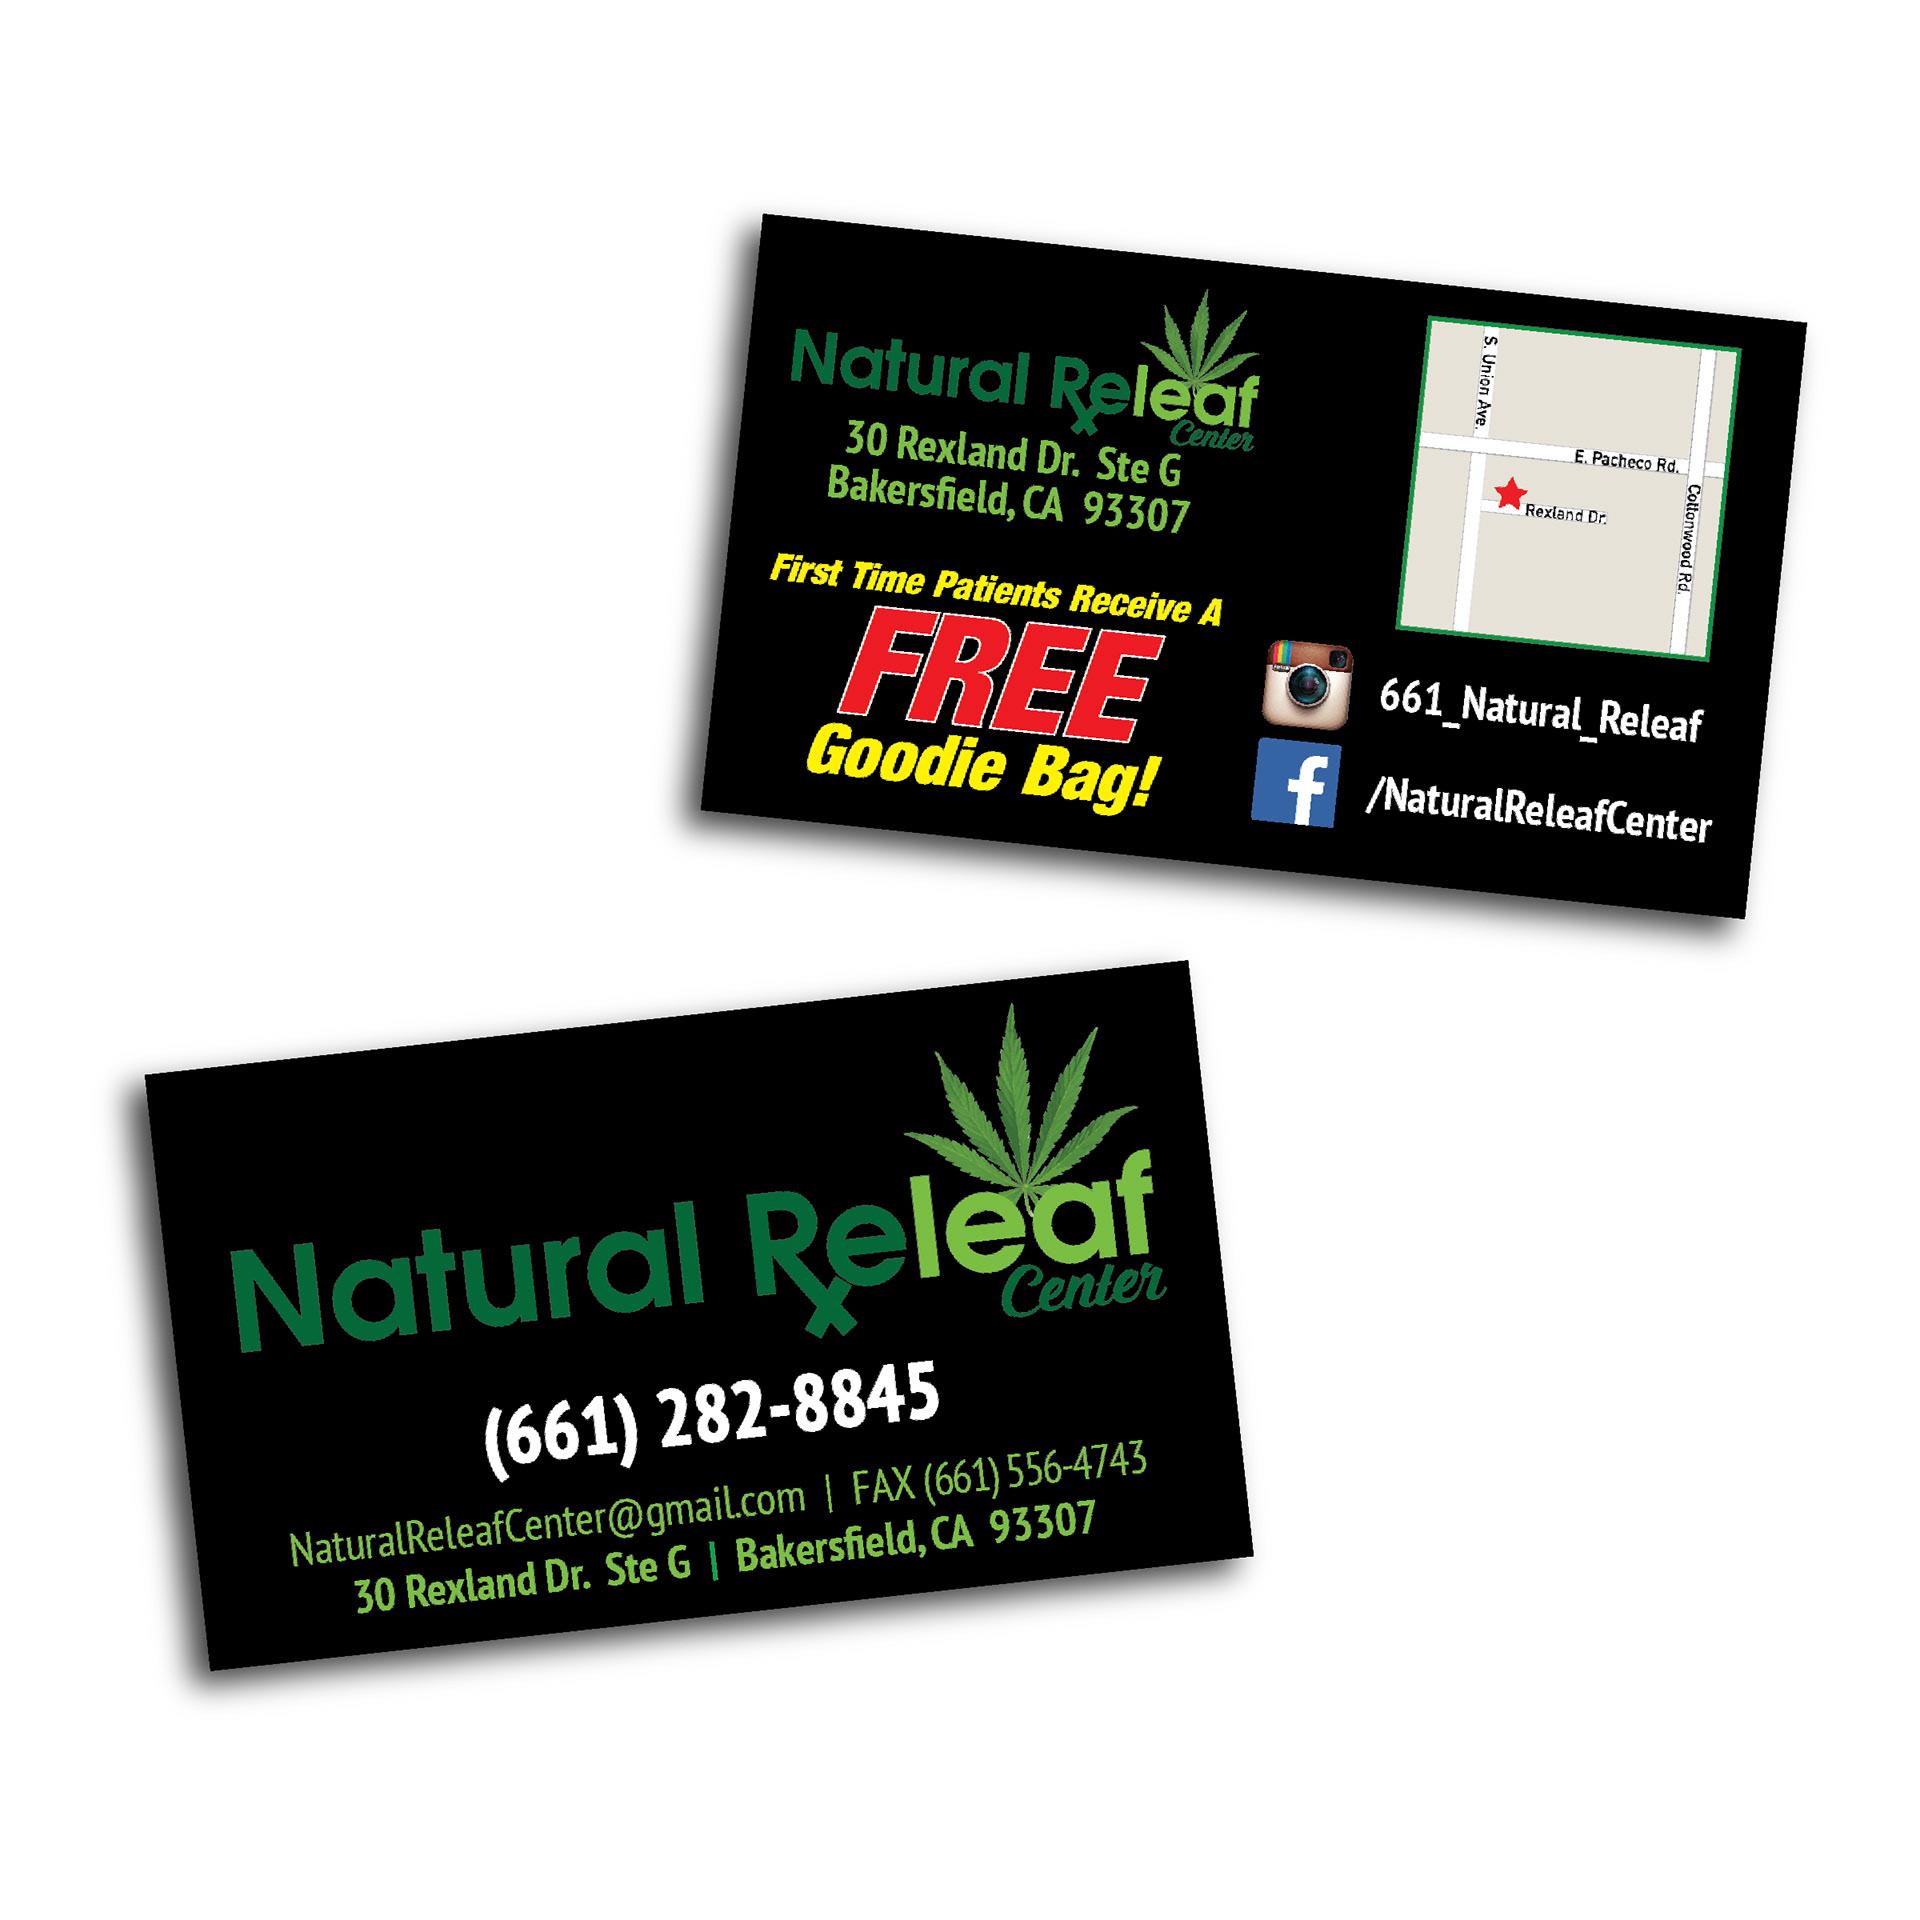 Ginomai creative design portfolio natural releaf center bakersfield ca logo design business card design reheart Images